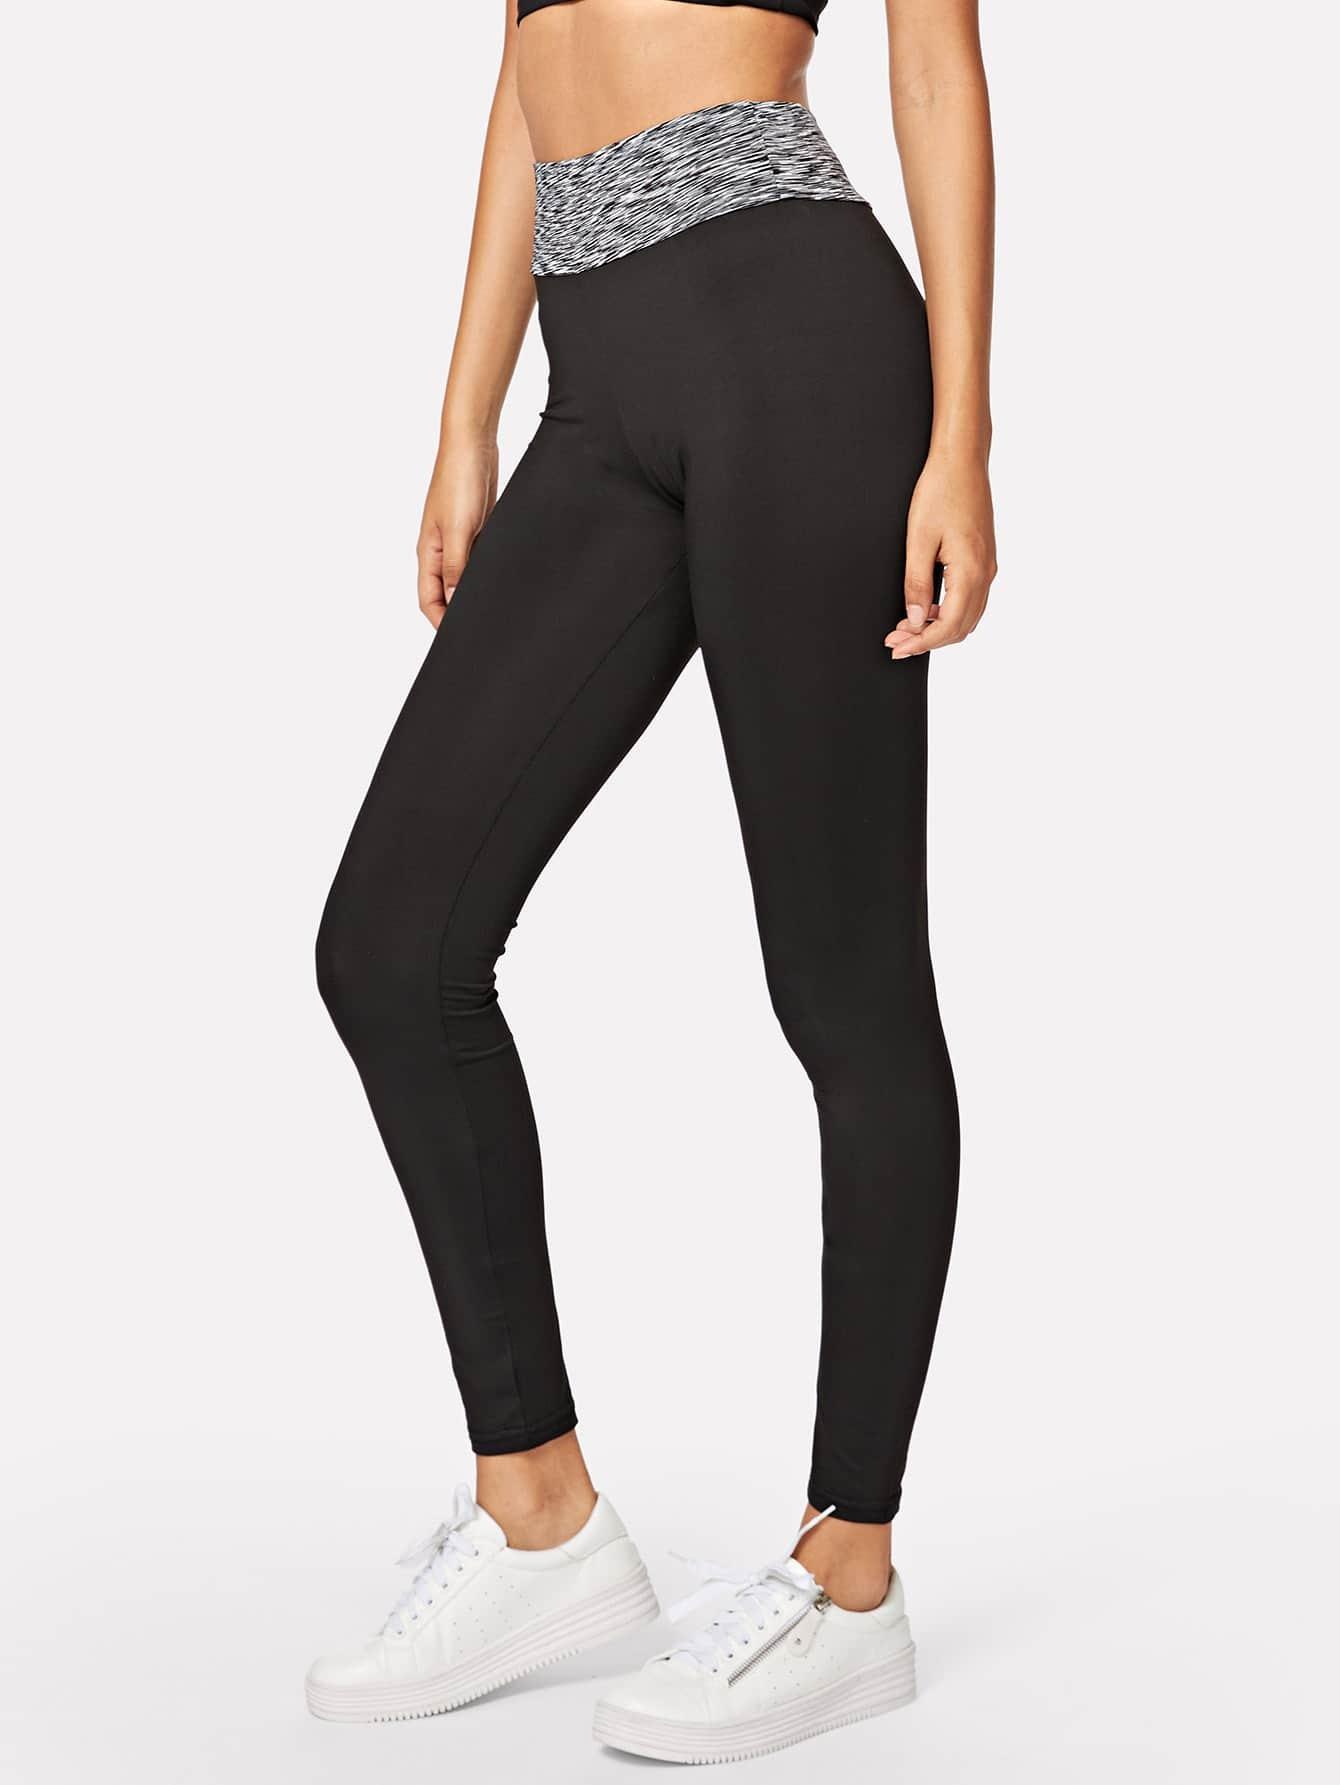 Elastic Waist Skinny Leggings elastic waist skinny leggings